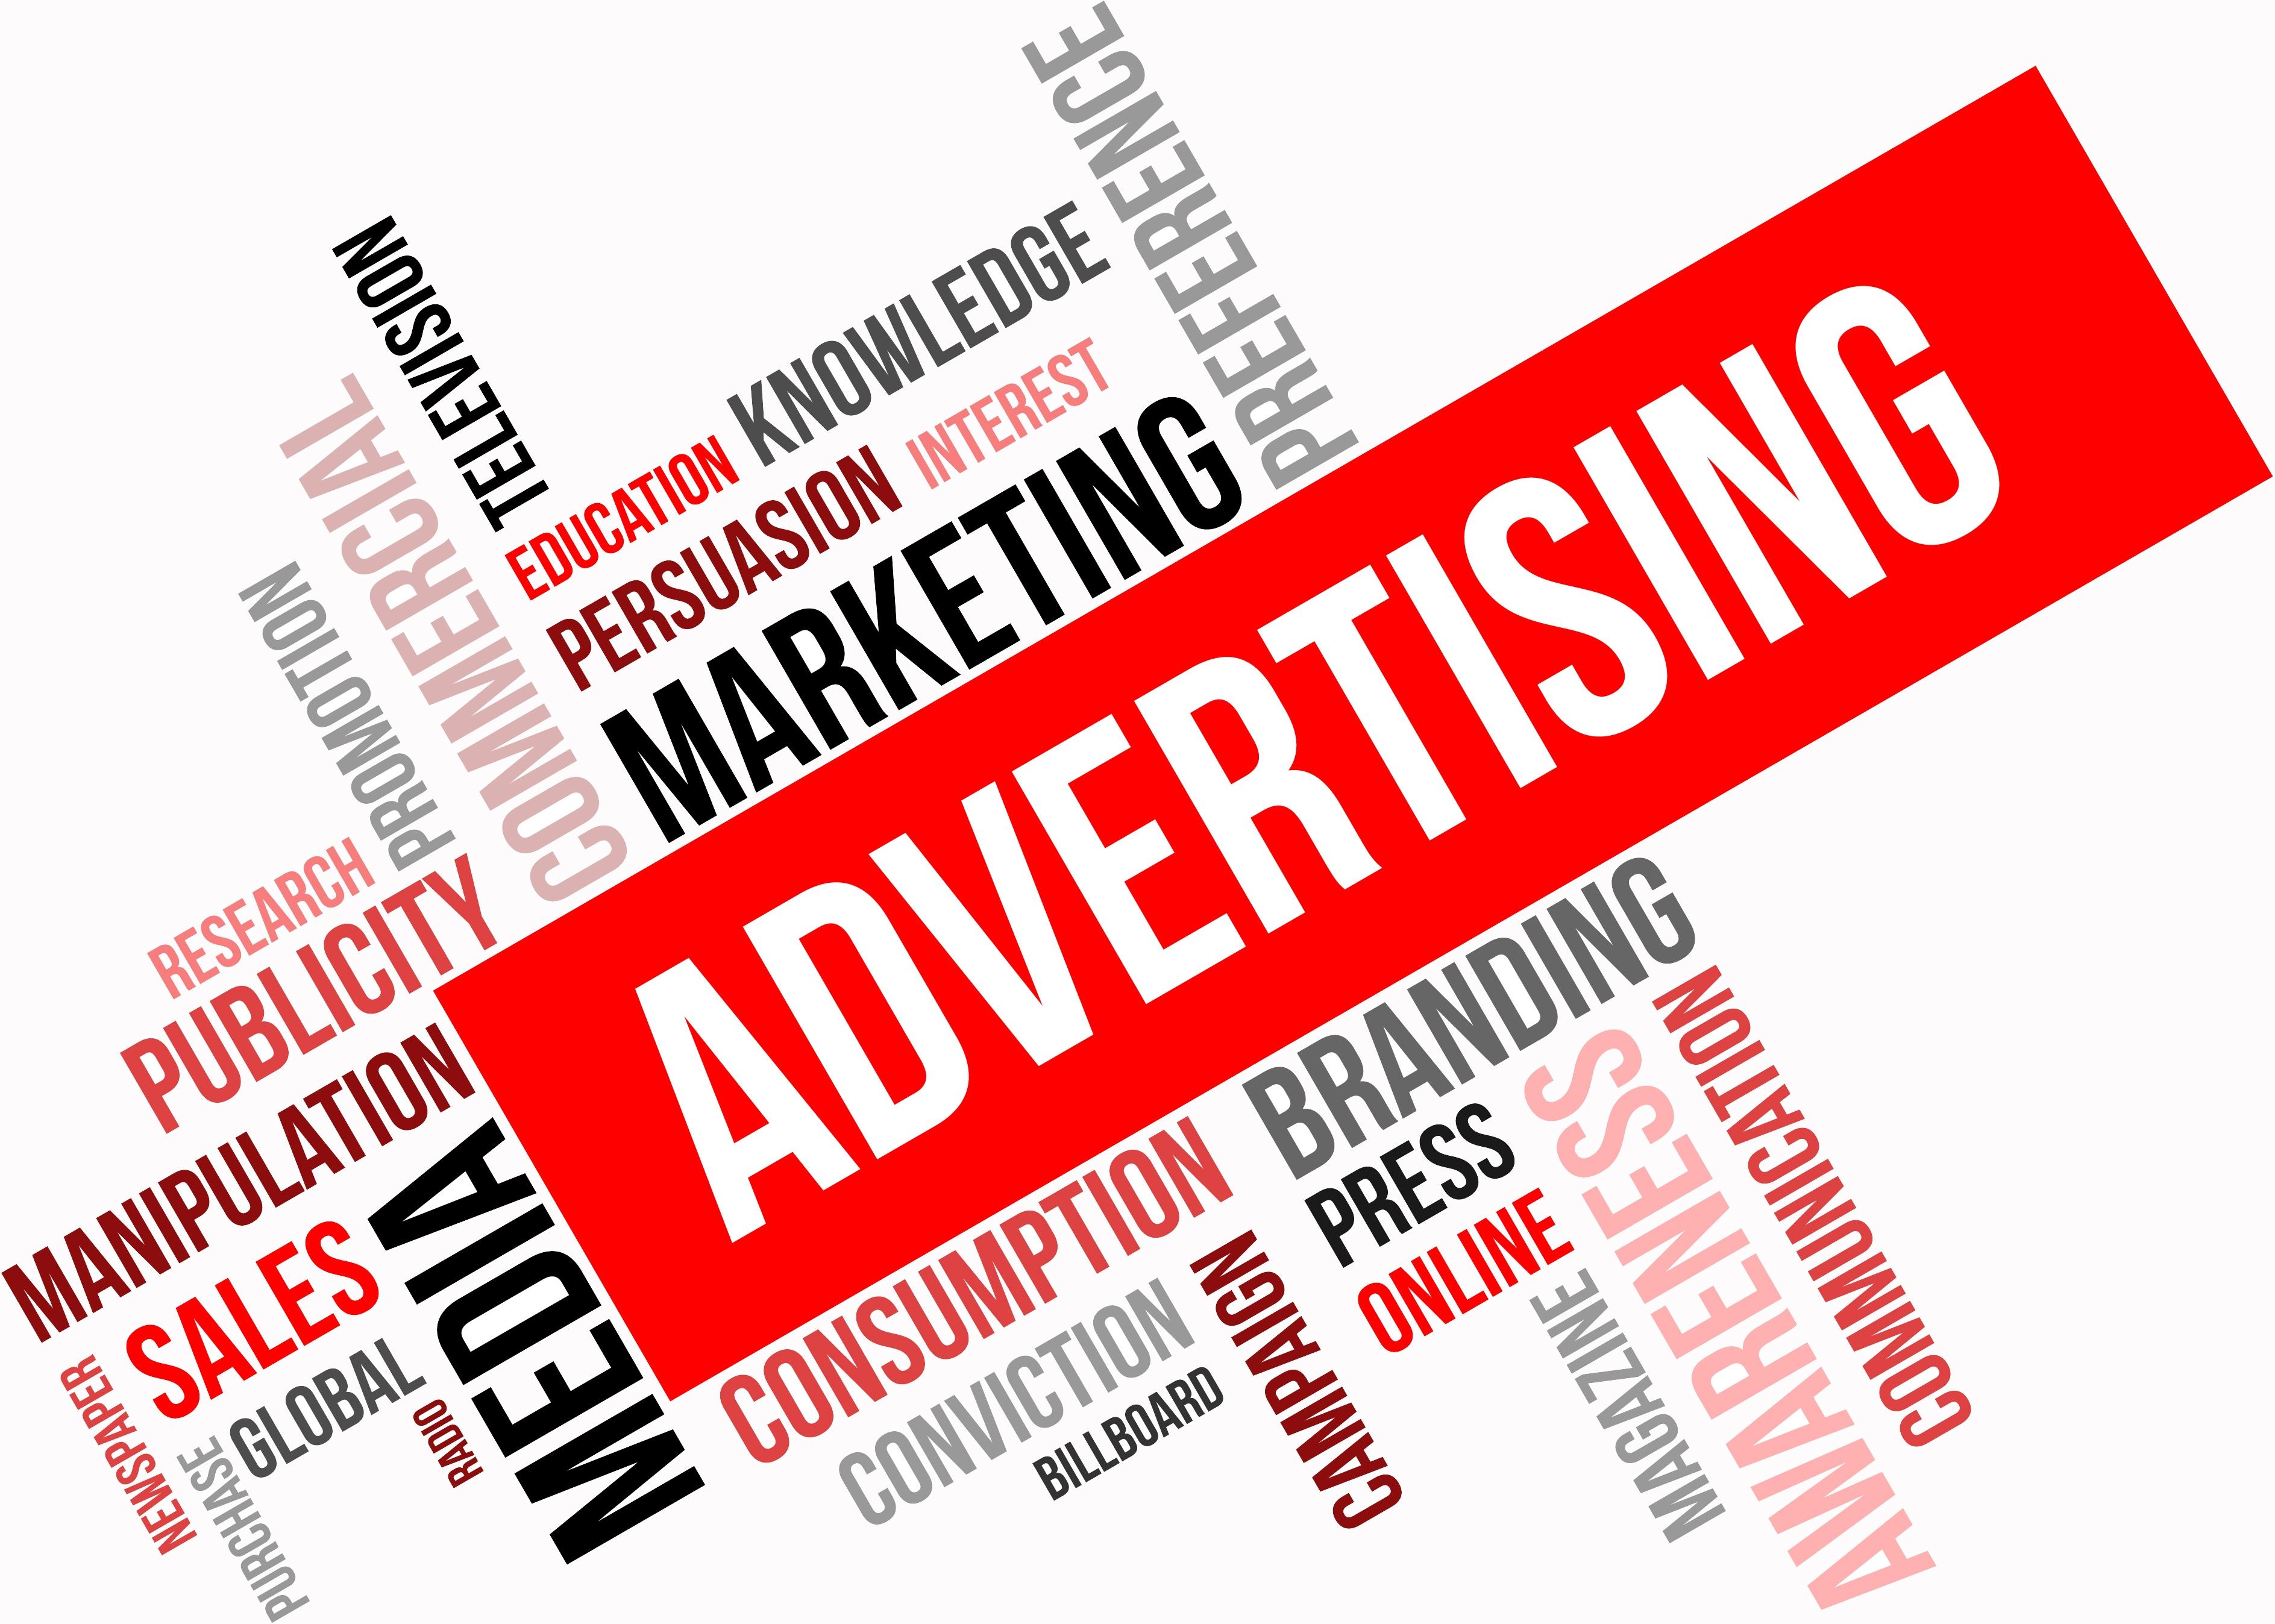 Advertising Secrets Going Back to The Basics